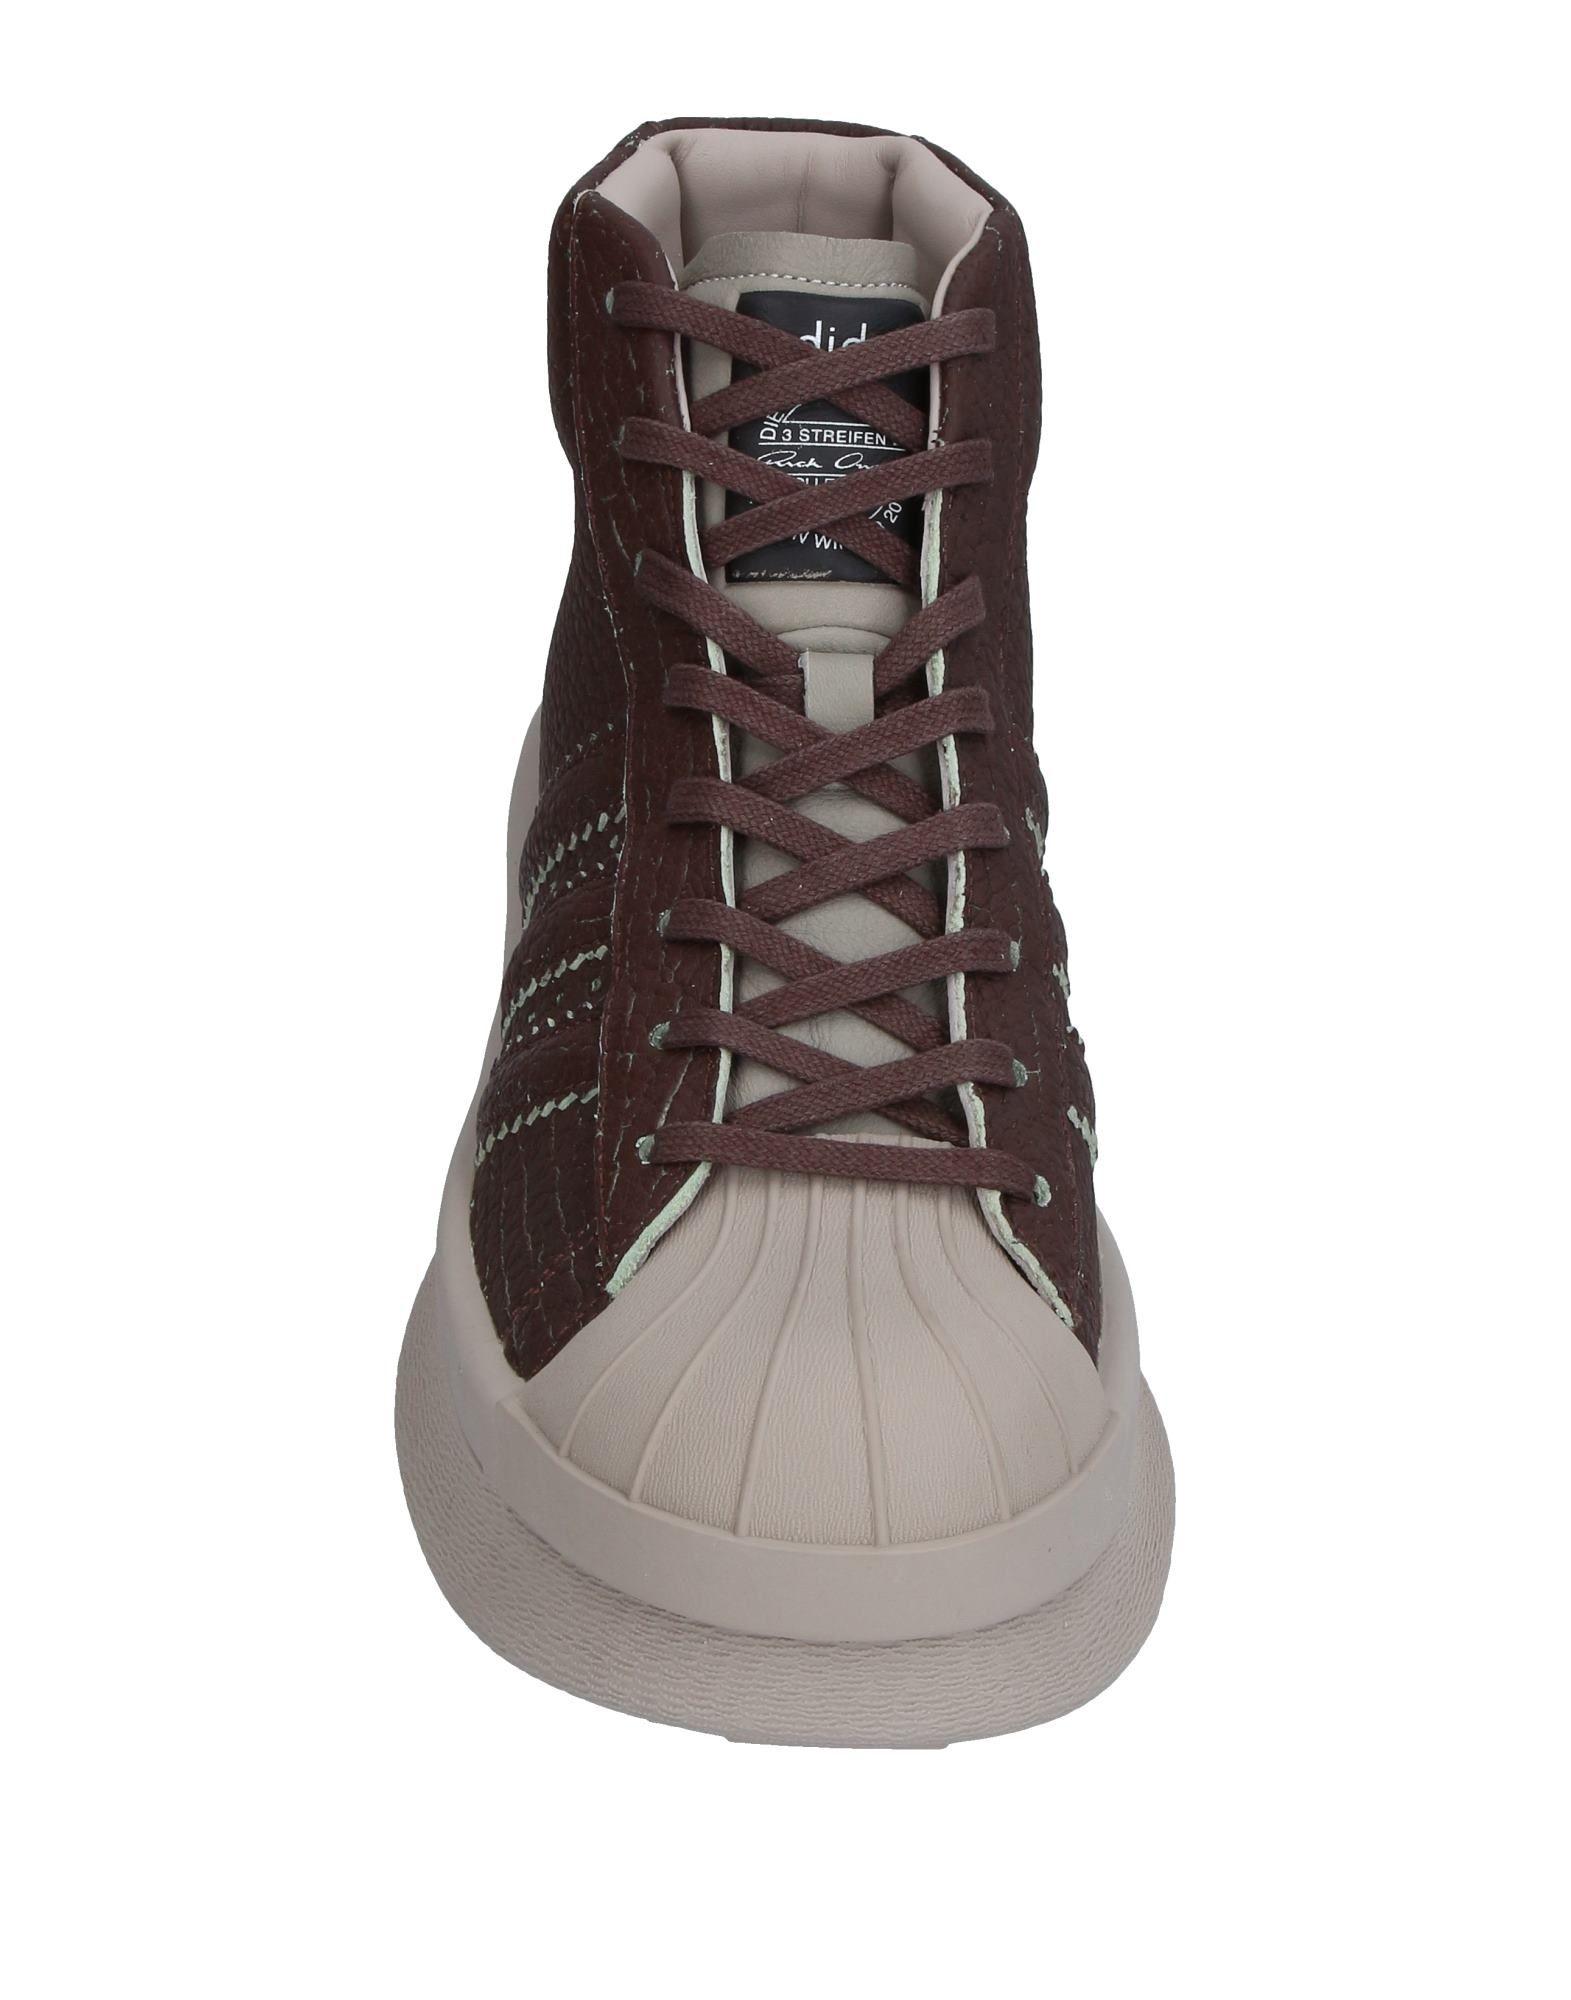 Rick Owens X Adidas Sneakers Herren beliebte  11238947BK Gute Qualität beliebte Herren Schuhe b3bf9d